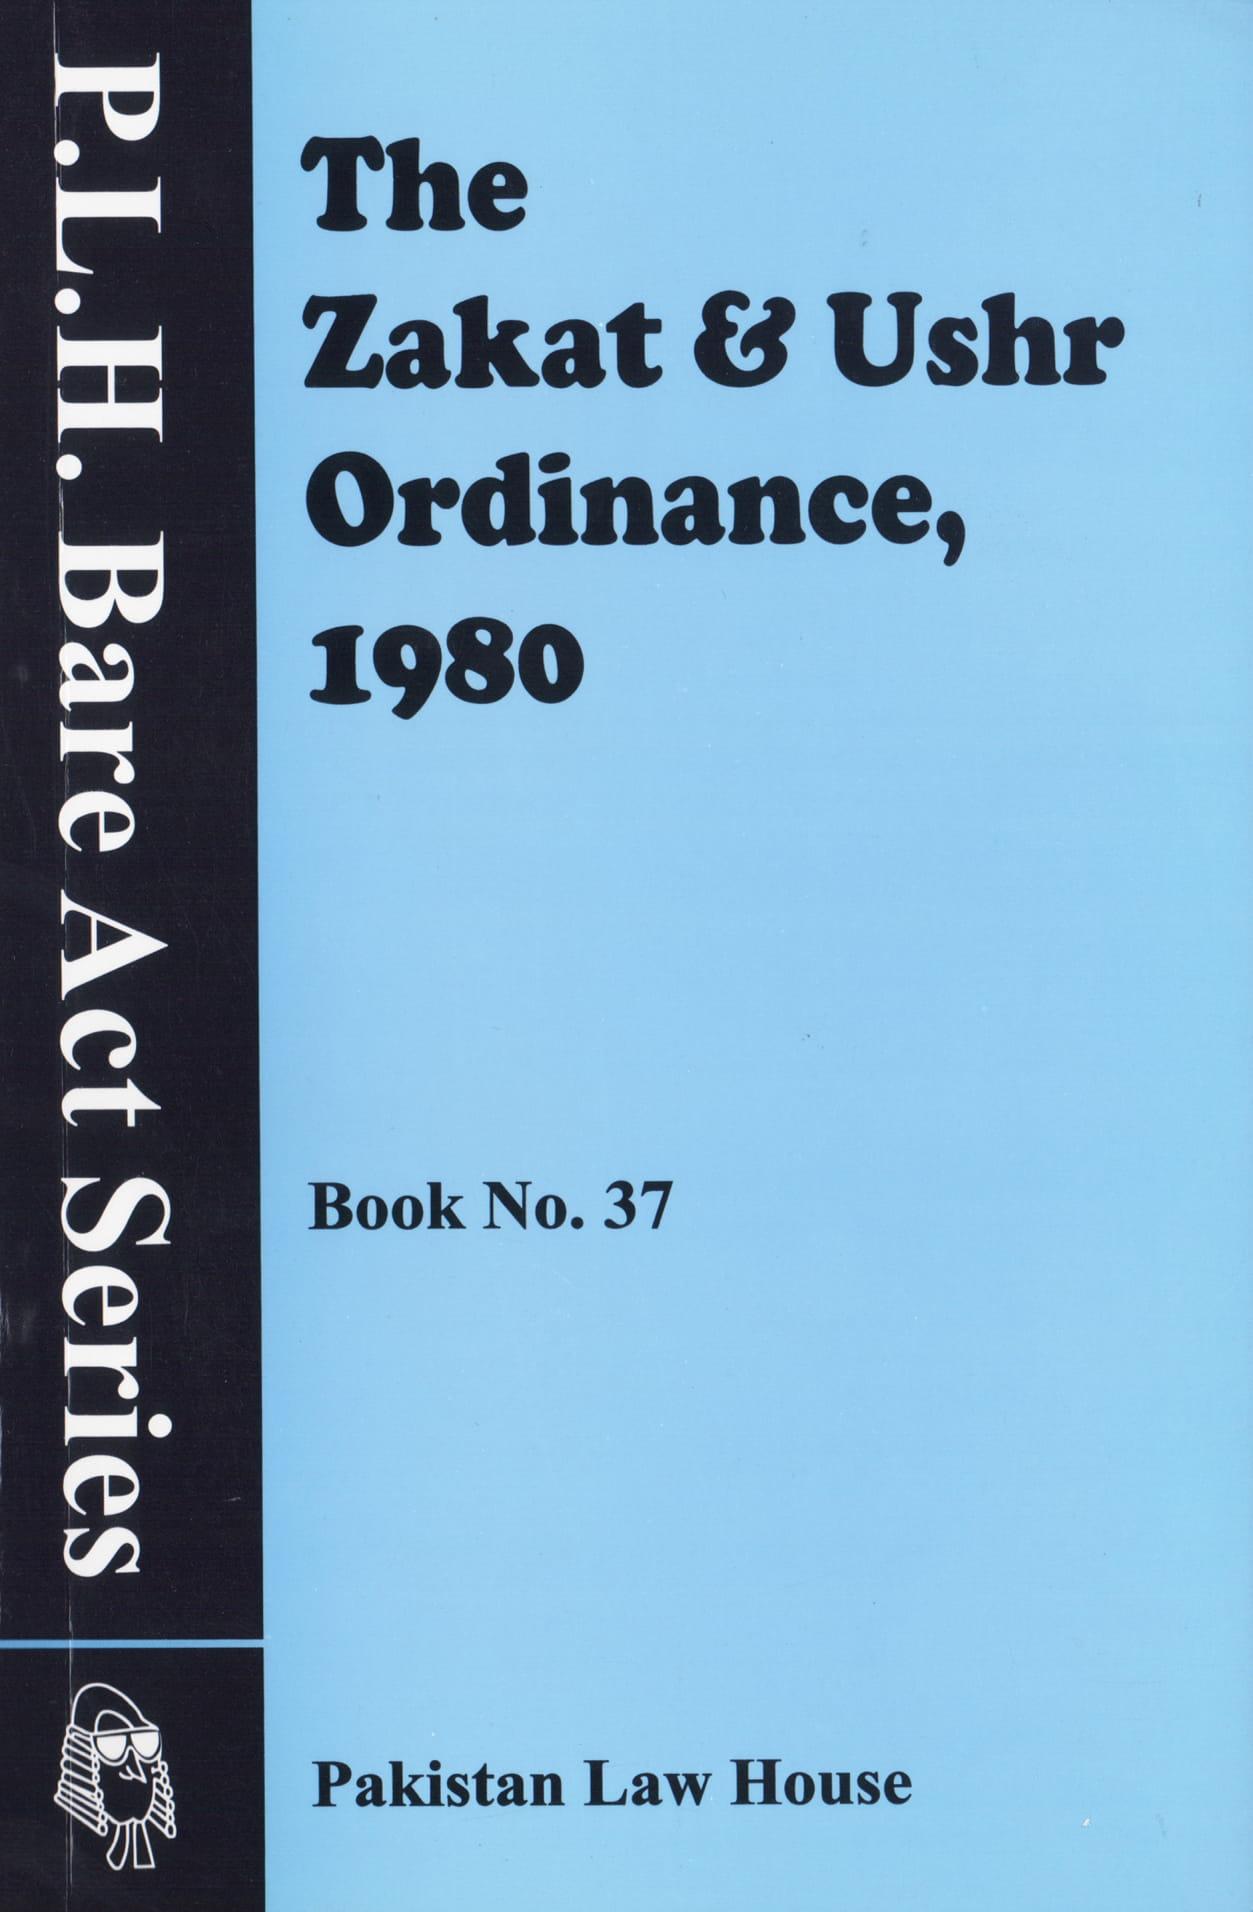 The Zakat And Ushr Ordinance, 1980